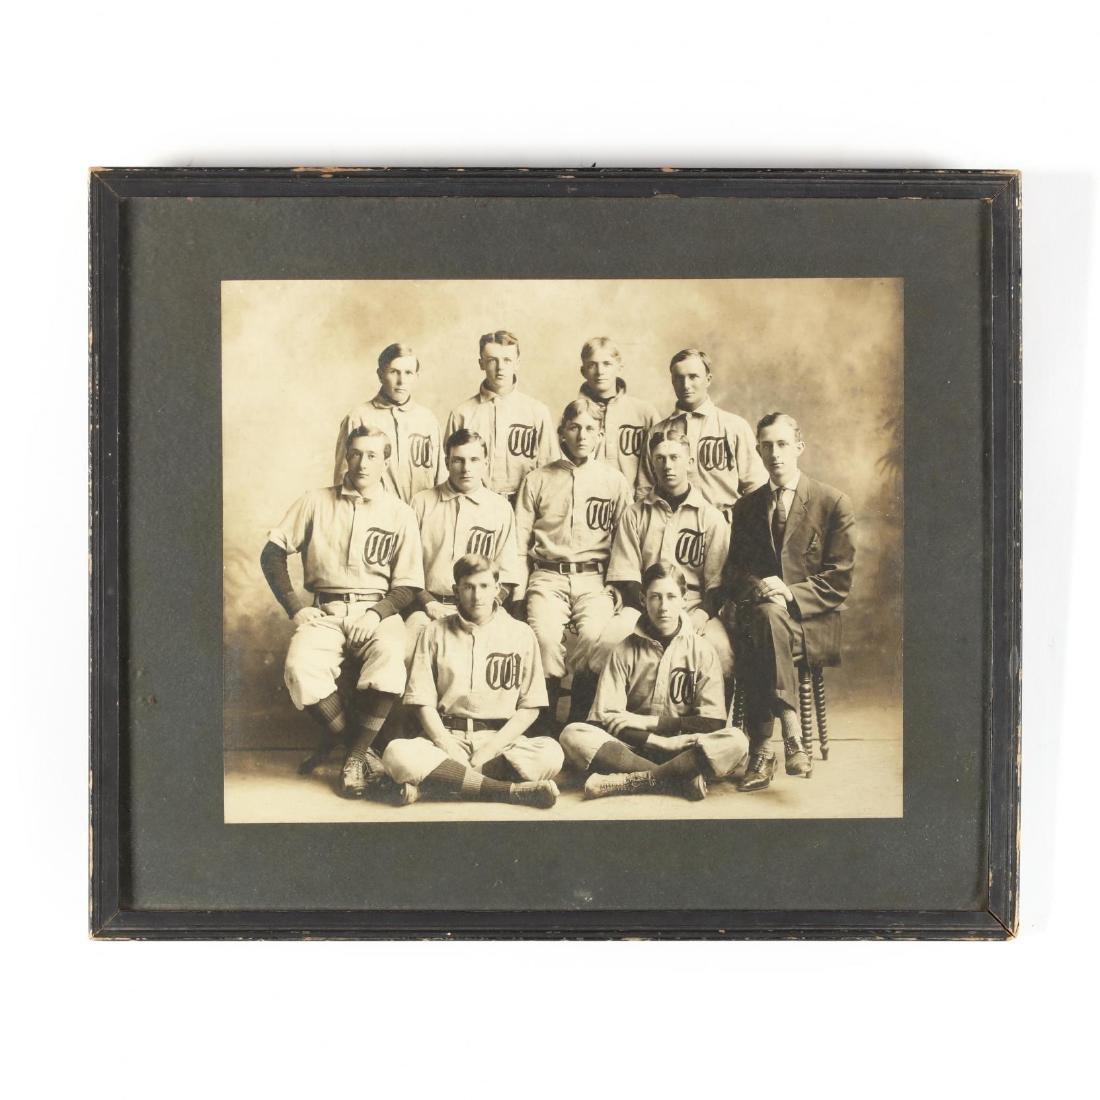 North Carolina School Baseball Team Photograph